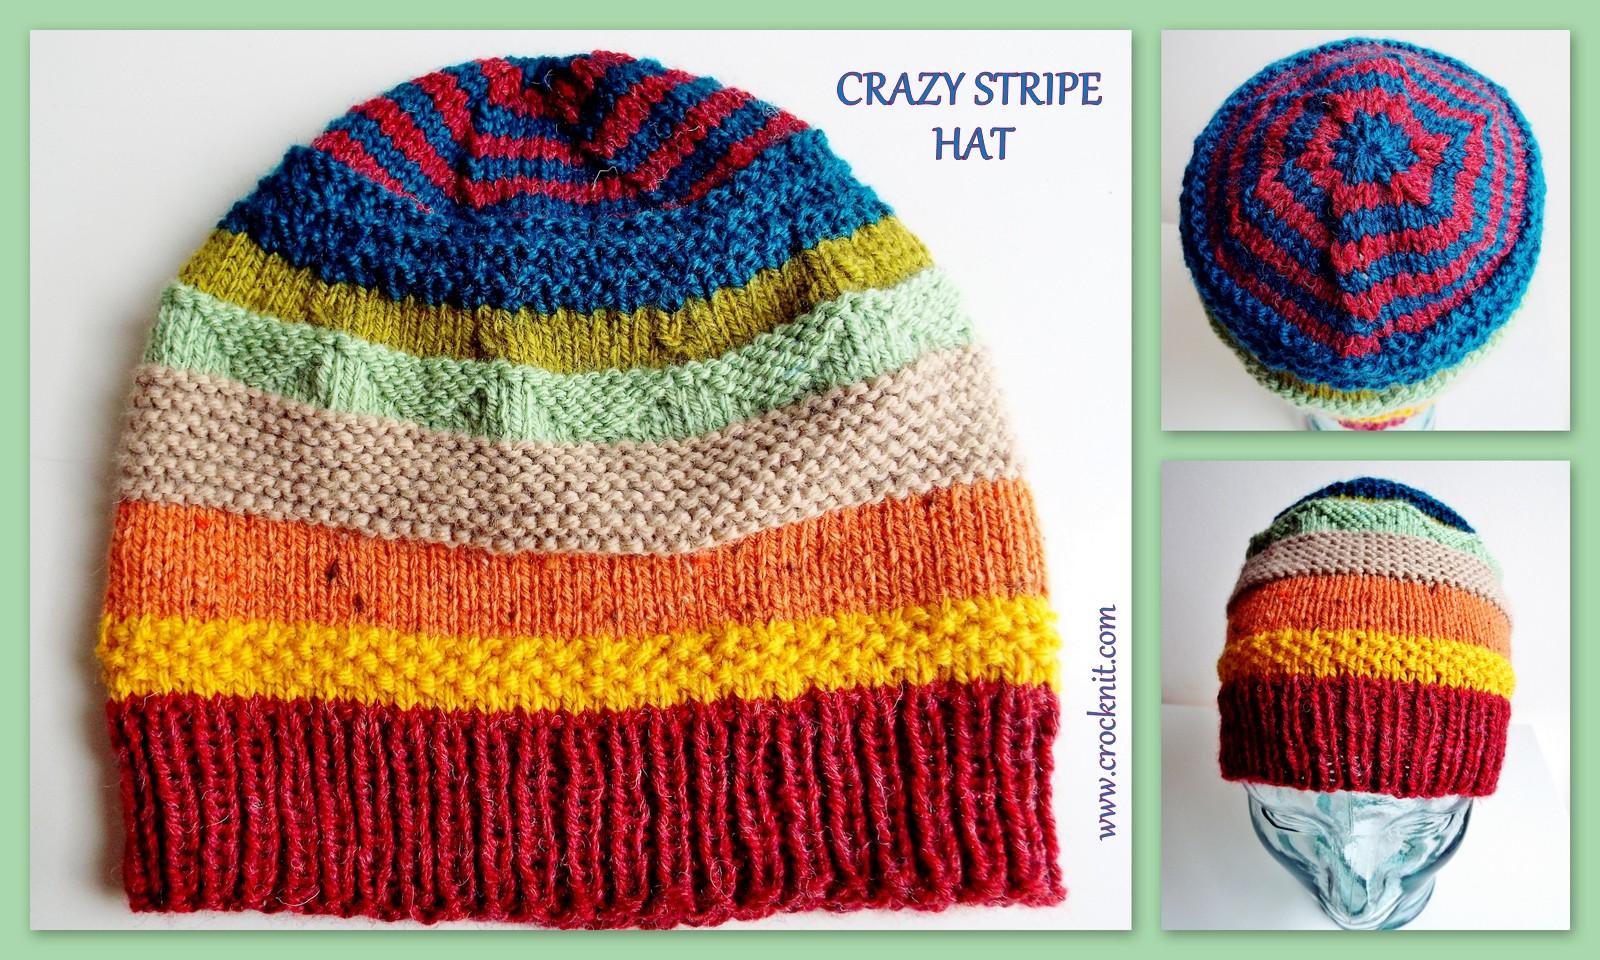 MICROCKNIT CREATIONS: CRAZY STRIPE HAT Free Knit Pattern